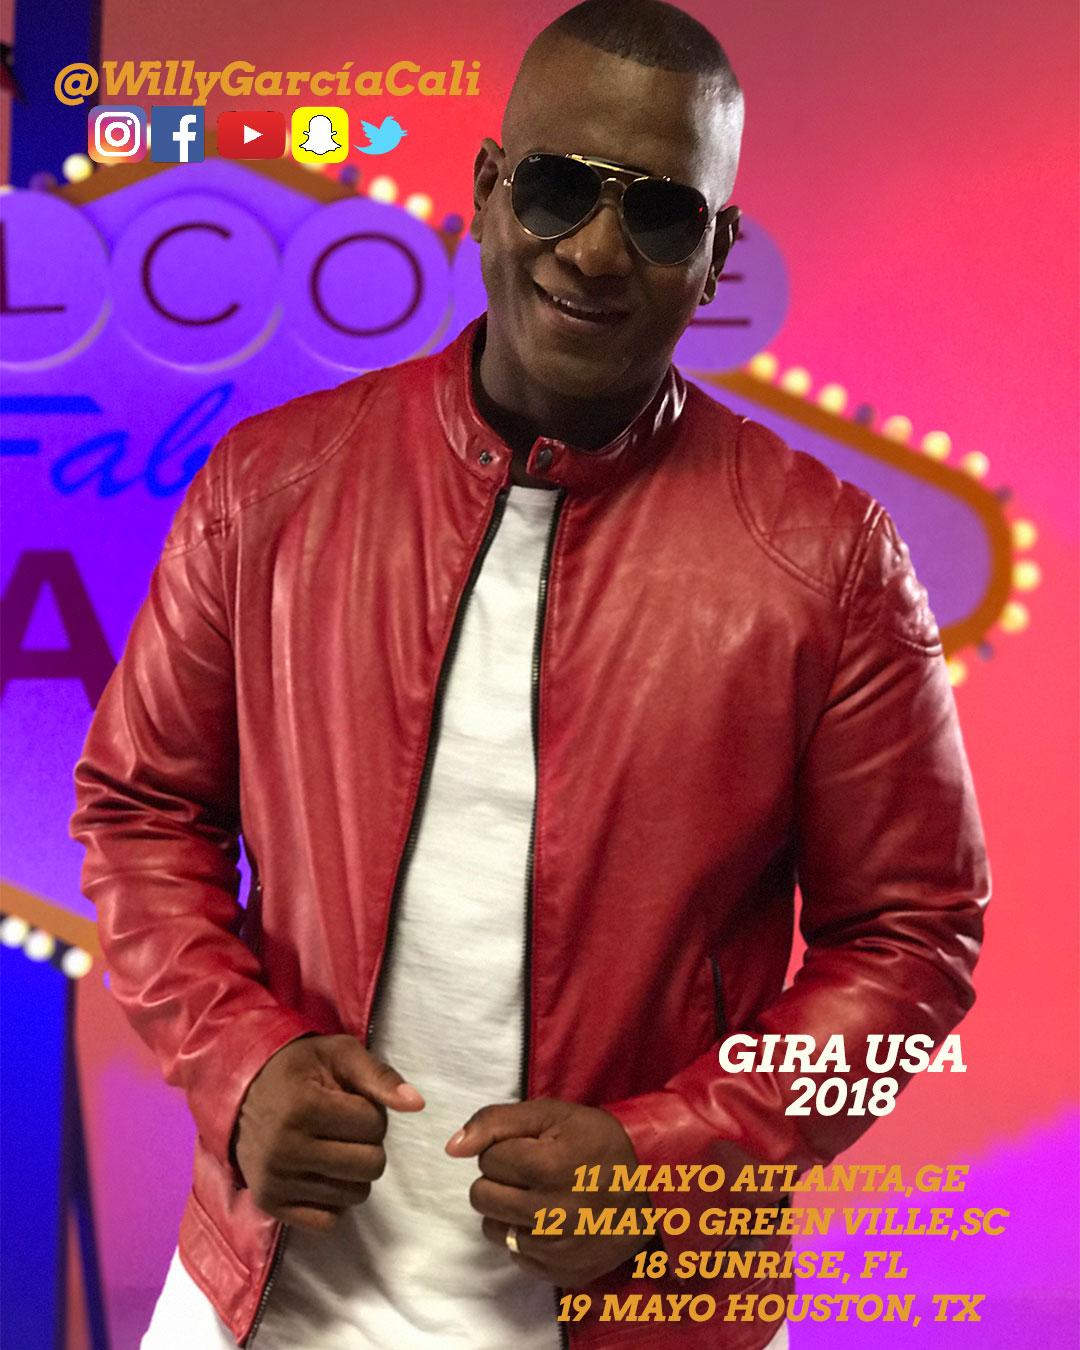 GIRA USA 2018